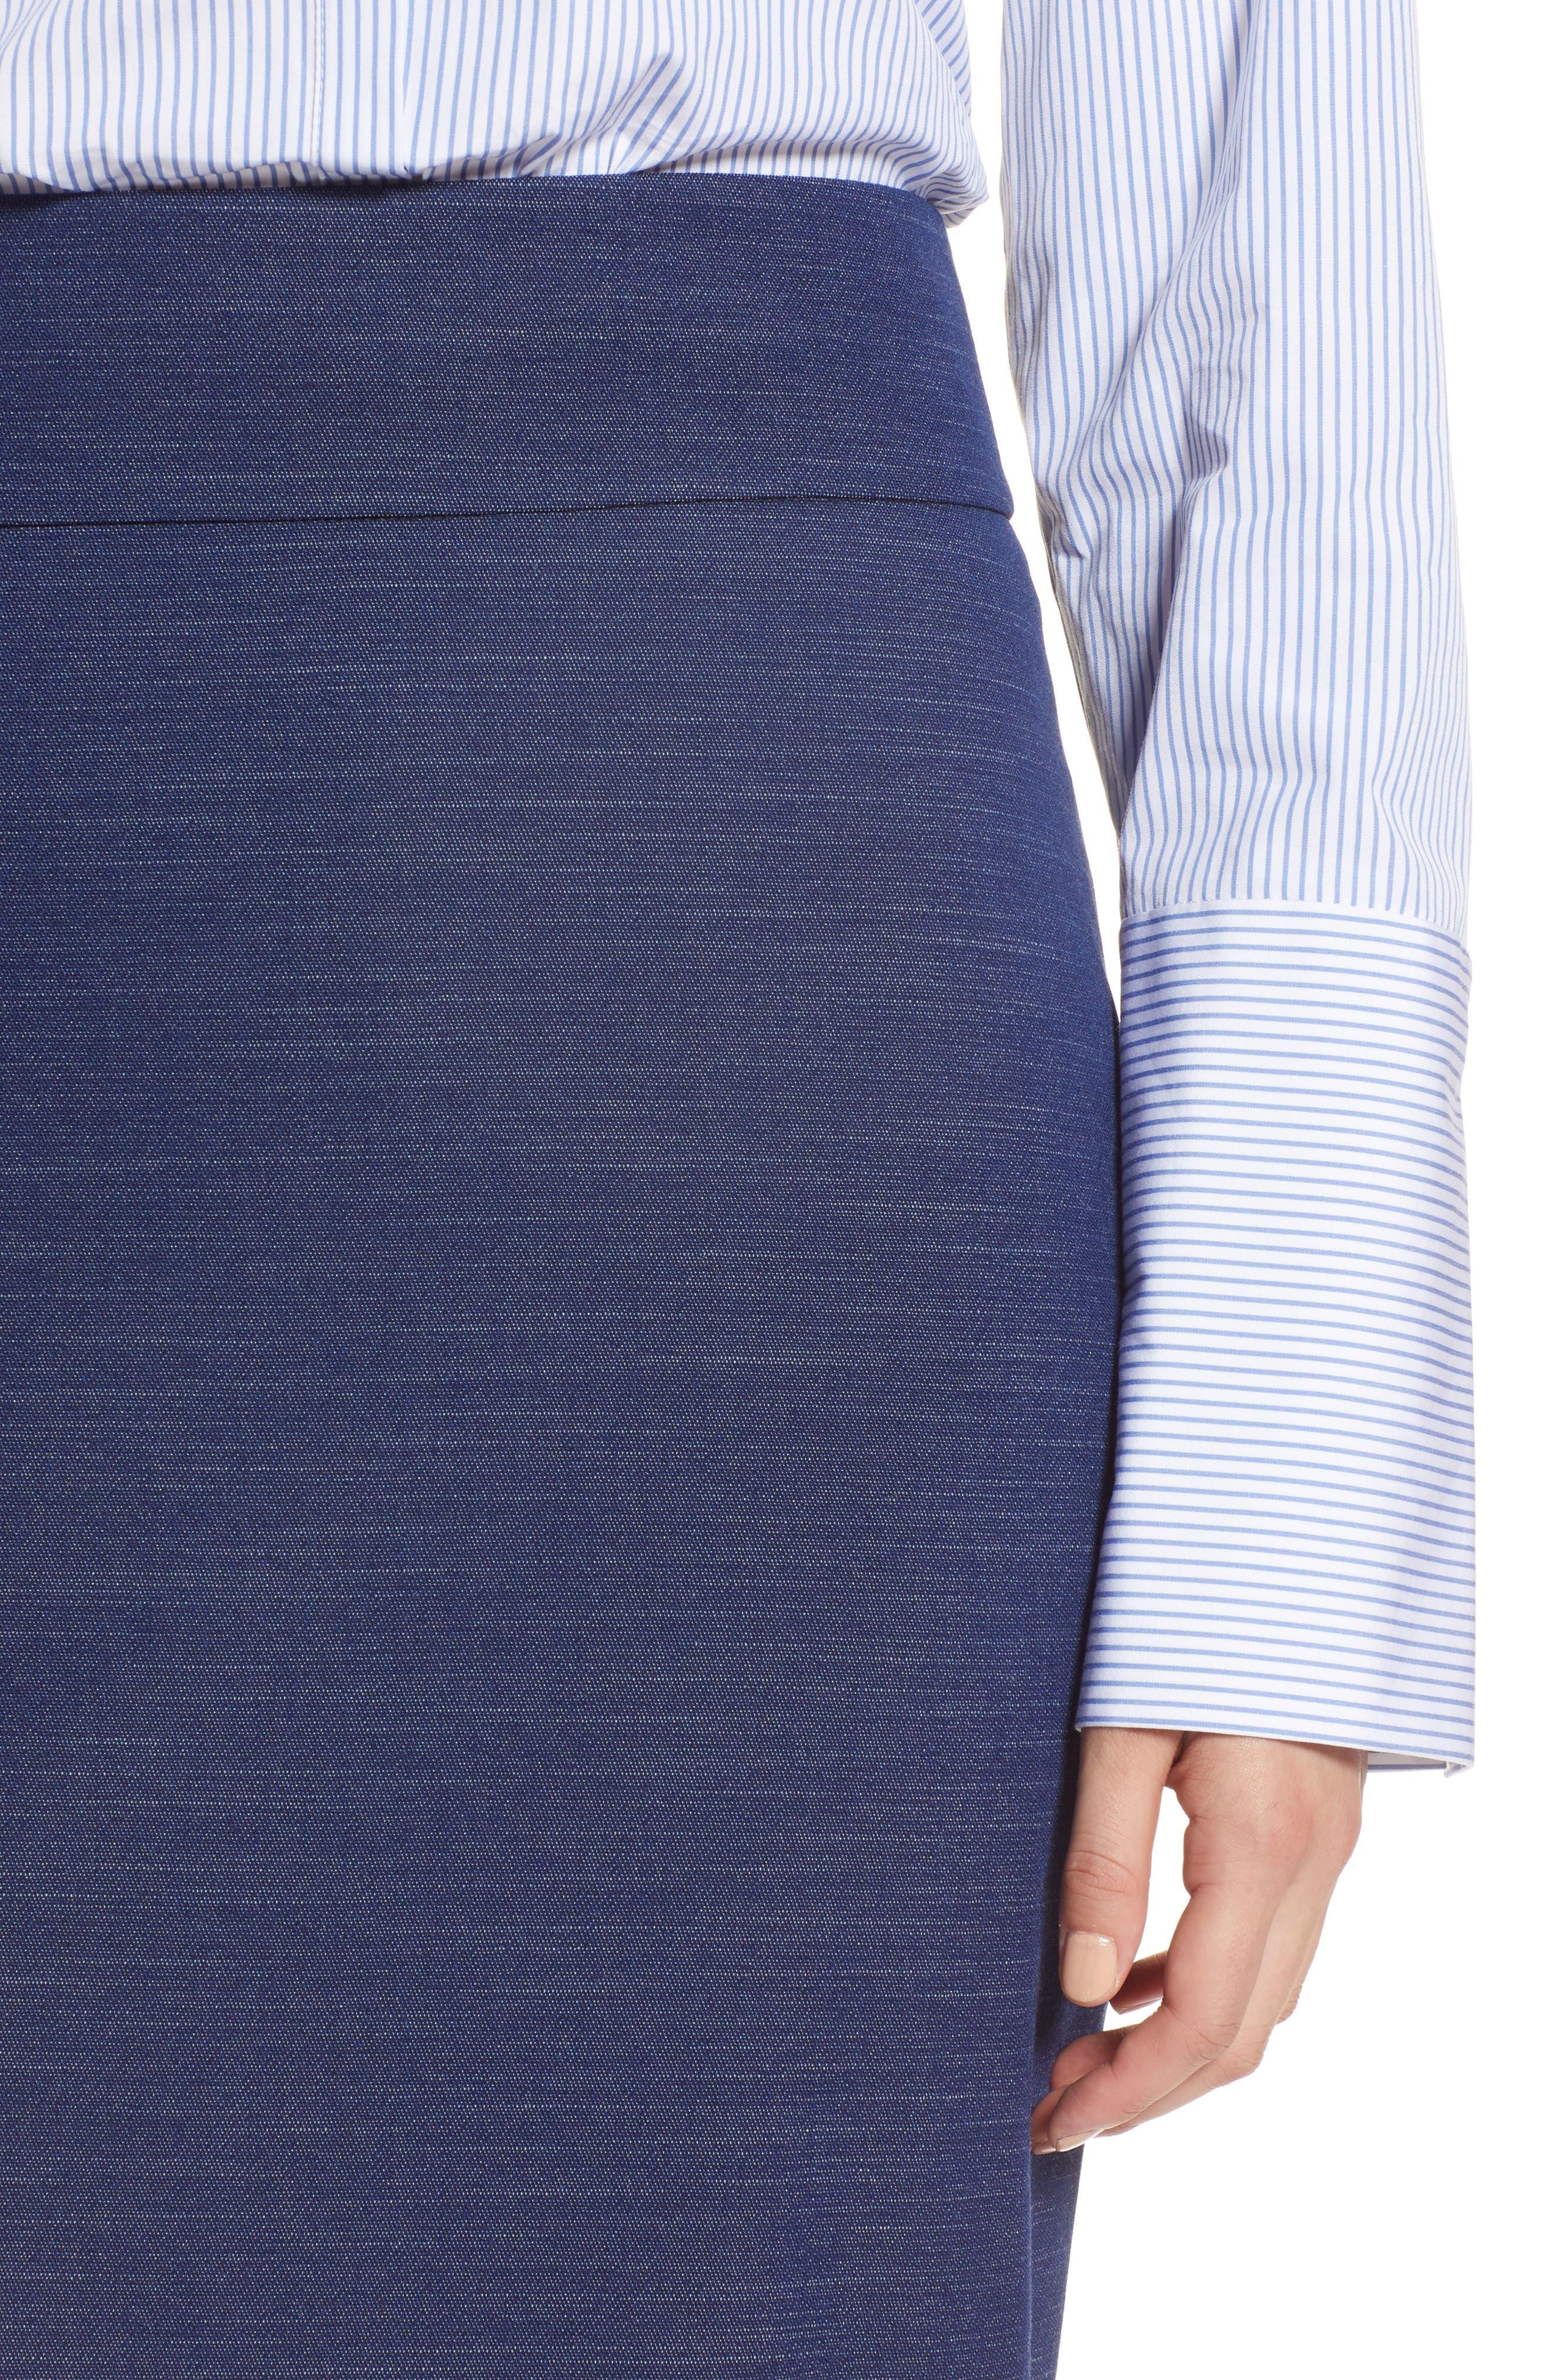 High Waist Chambray Skirt,                             Alternate thumbnail 4, color,                             Dark Chambray